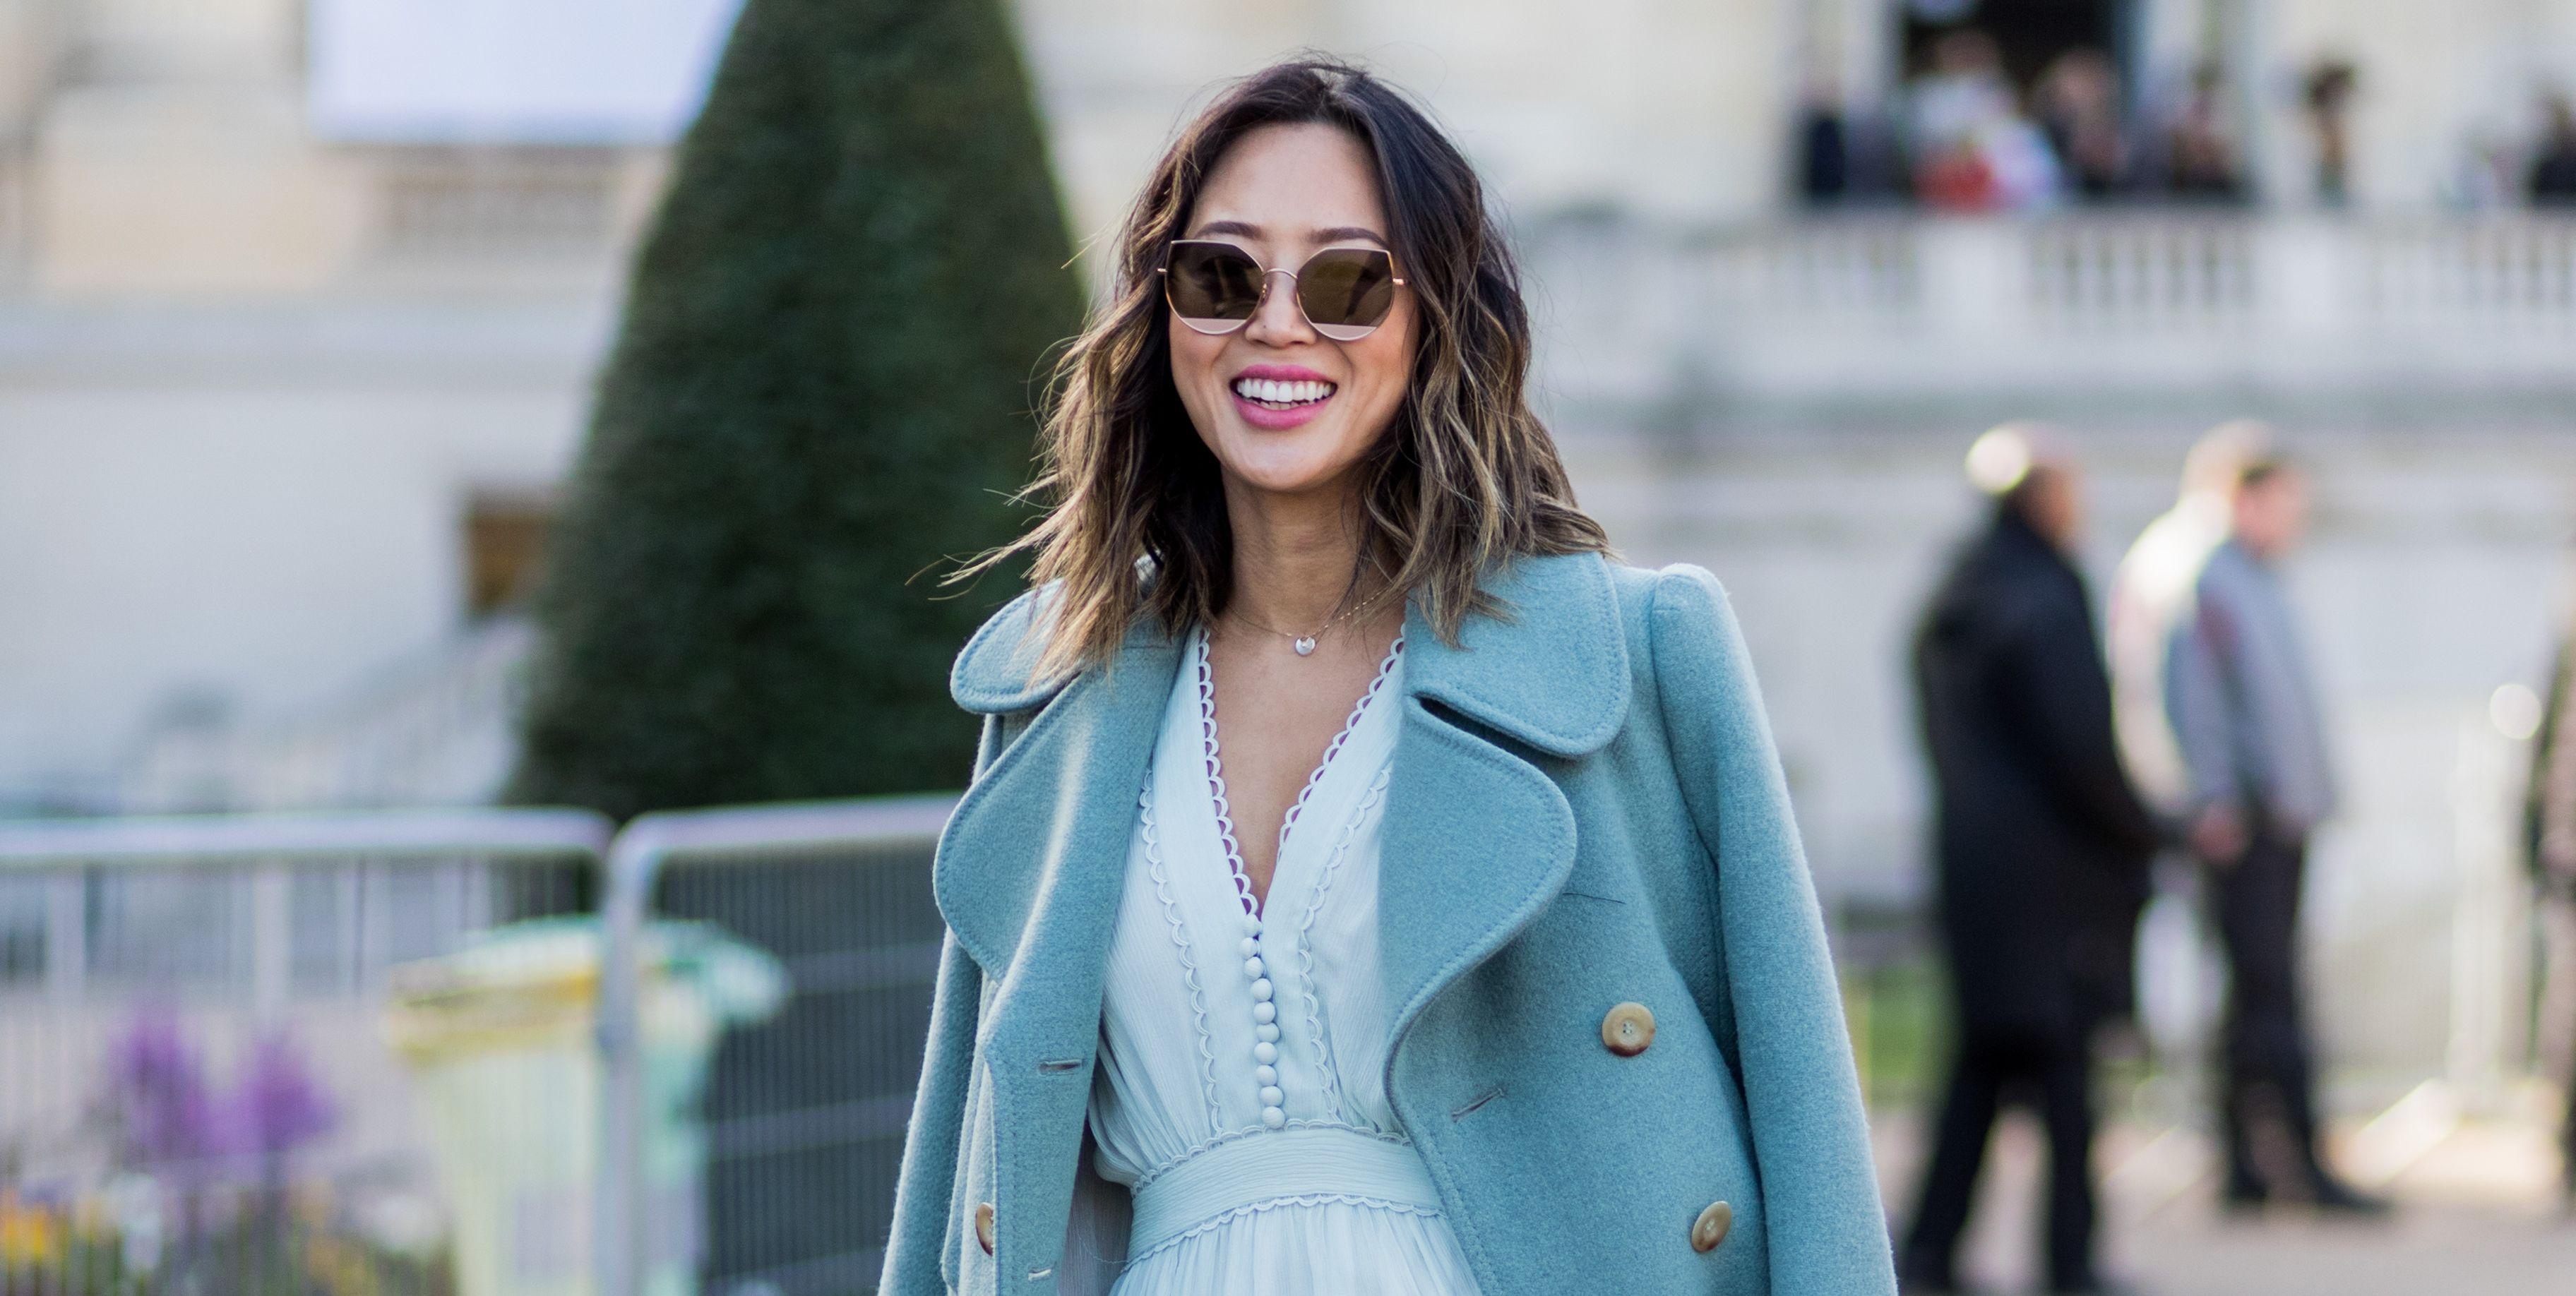 Fashion - Latest 2018 Fashion Trends & News For Women